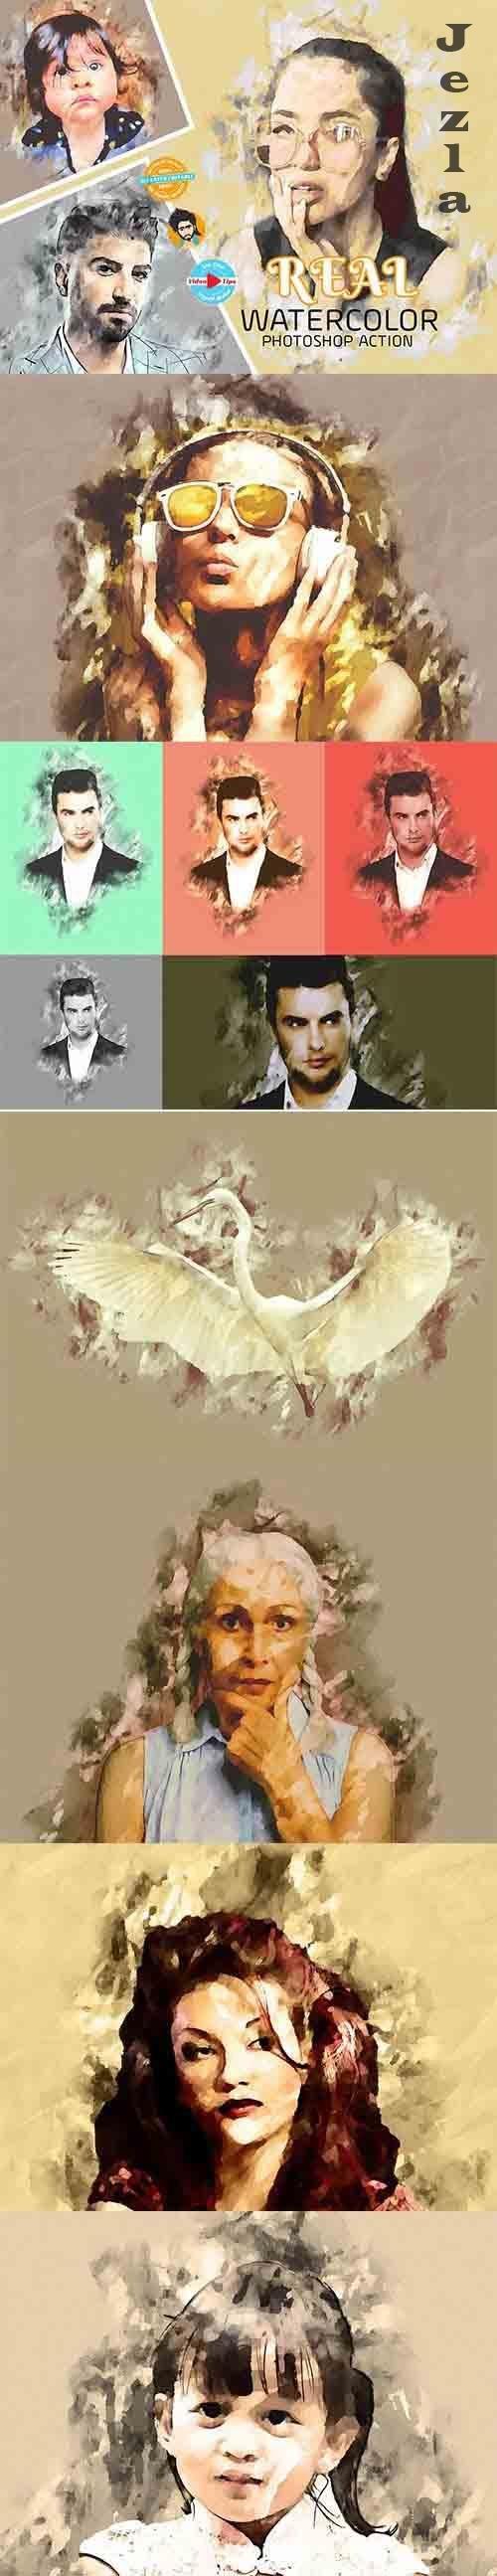 CreativeMarket - Real Watercolor Photoshop Action 5985513